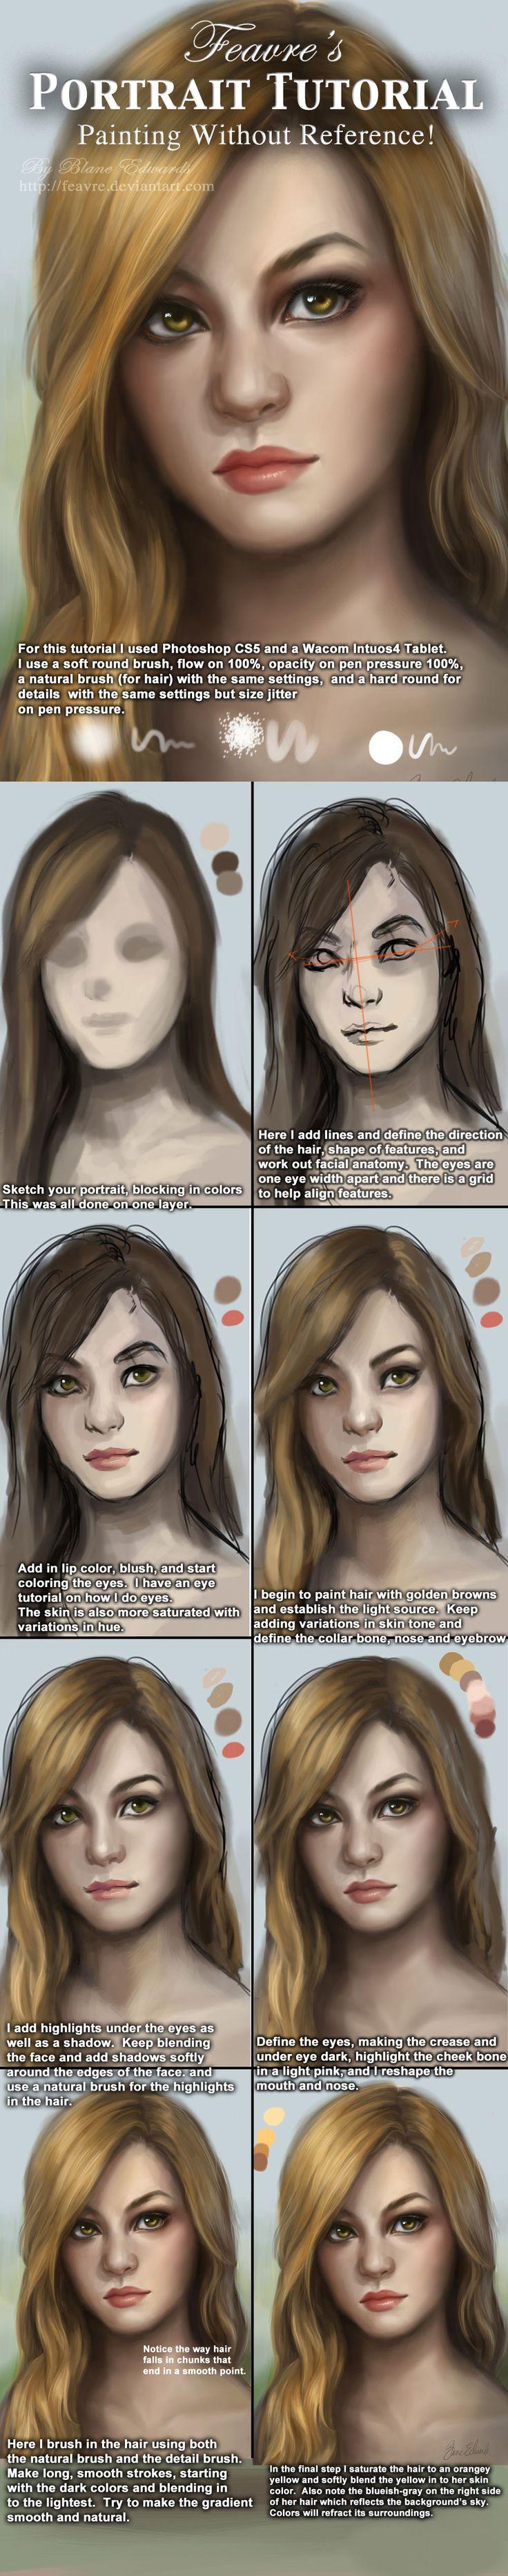 Portrait / Face painting Tutorial by feavre.deviantart.com on @deviantART